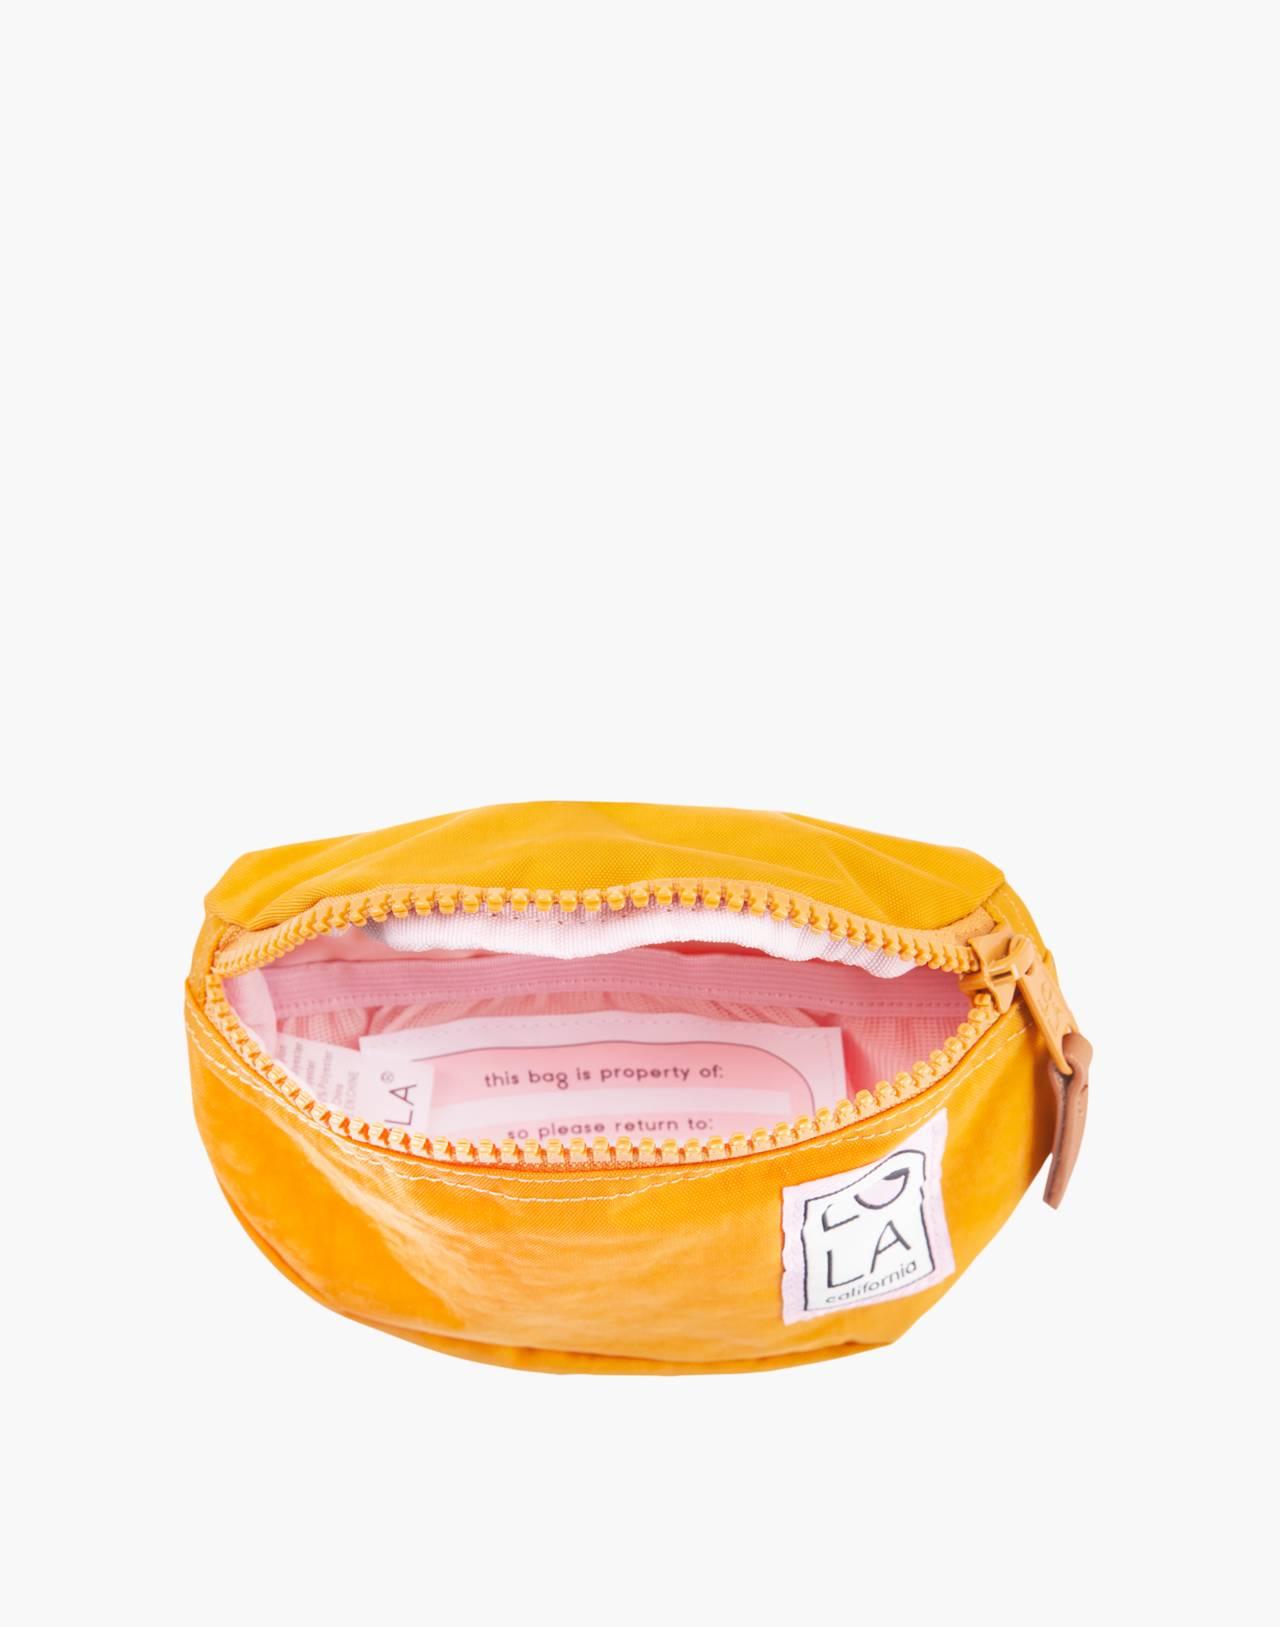 LOLA™ Mondo Moonbeam Bum Bag in yellow image 2